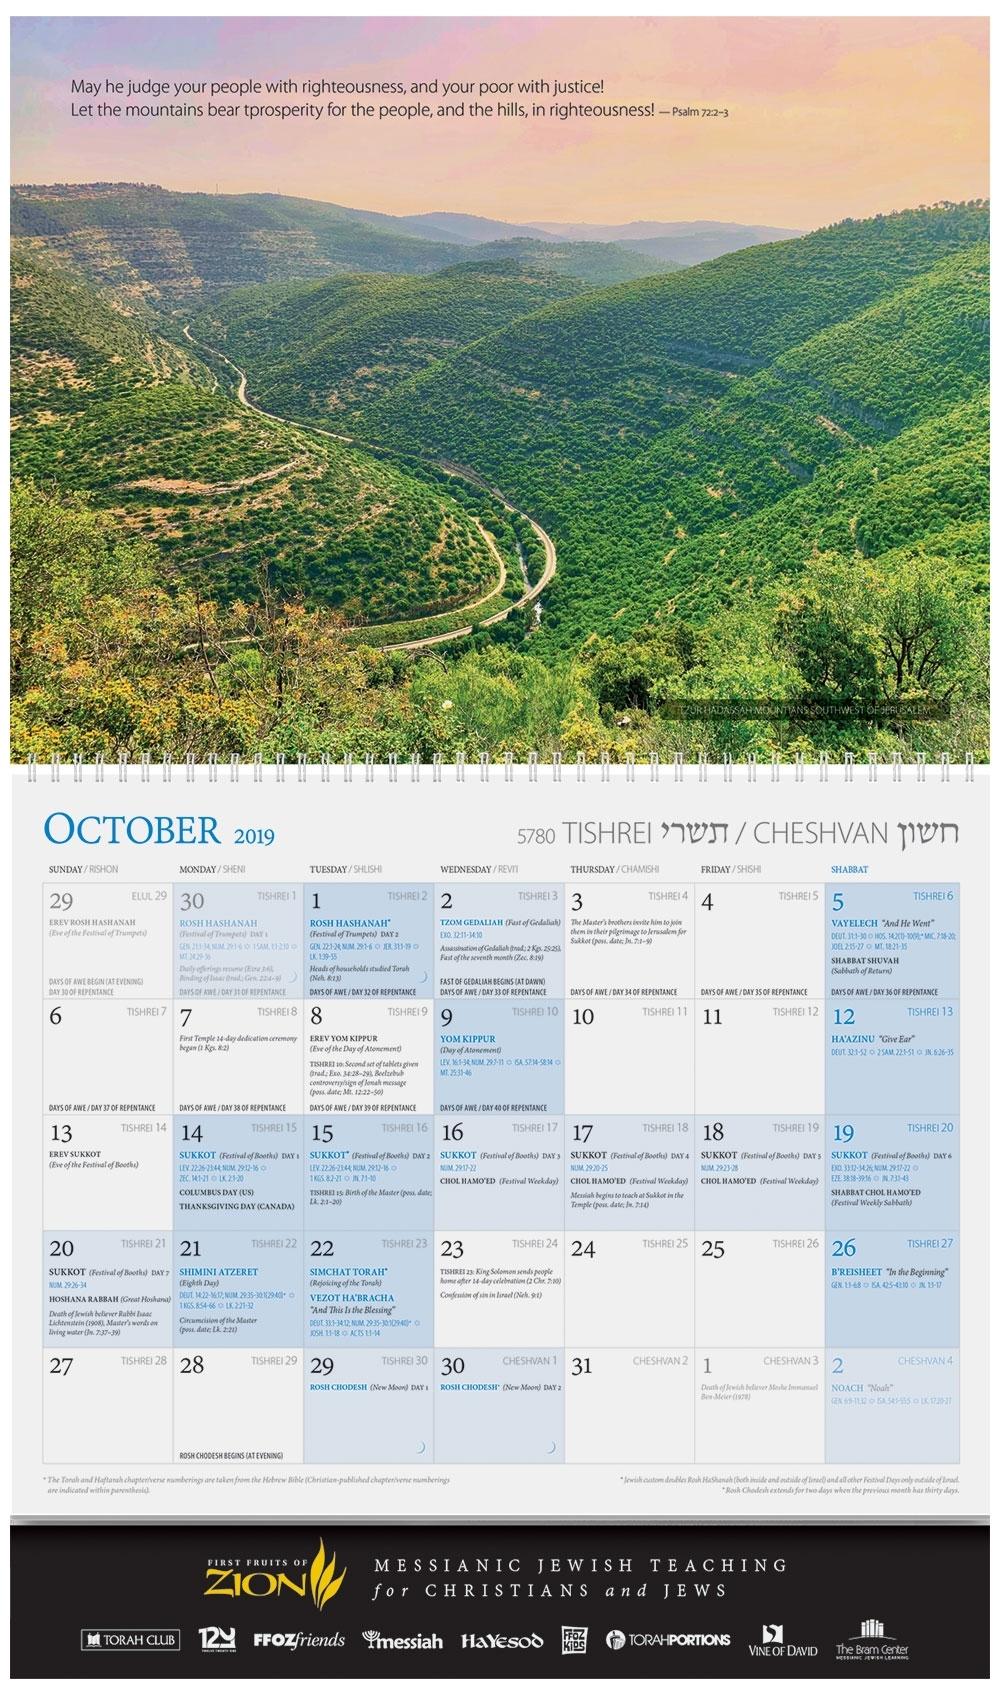 Weekly Torah Parsha Calendar For 2019/2020 - Calendar